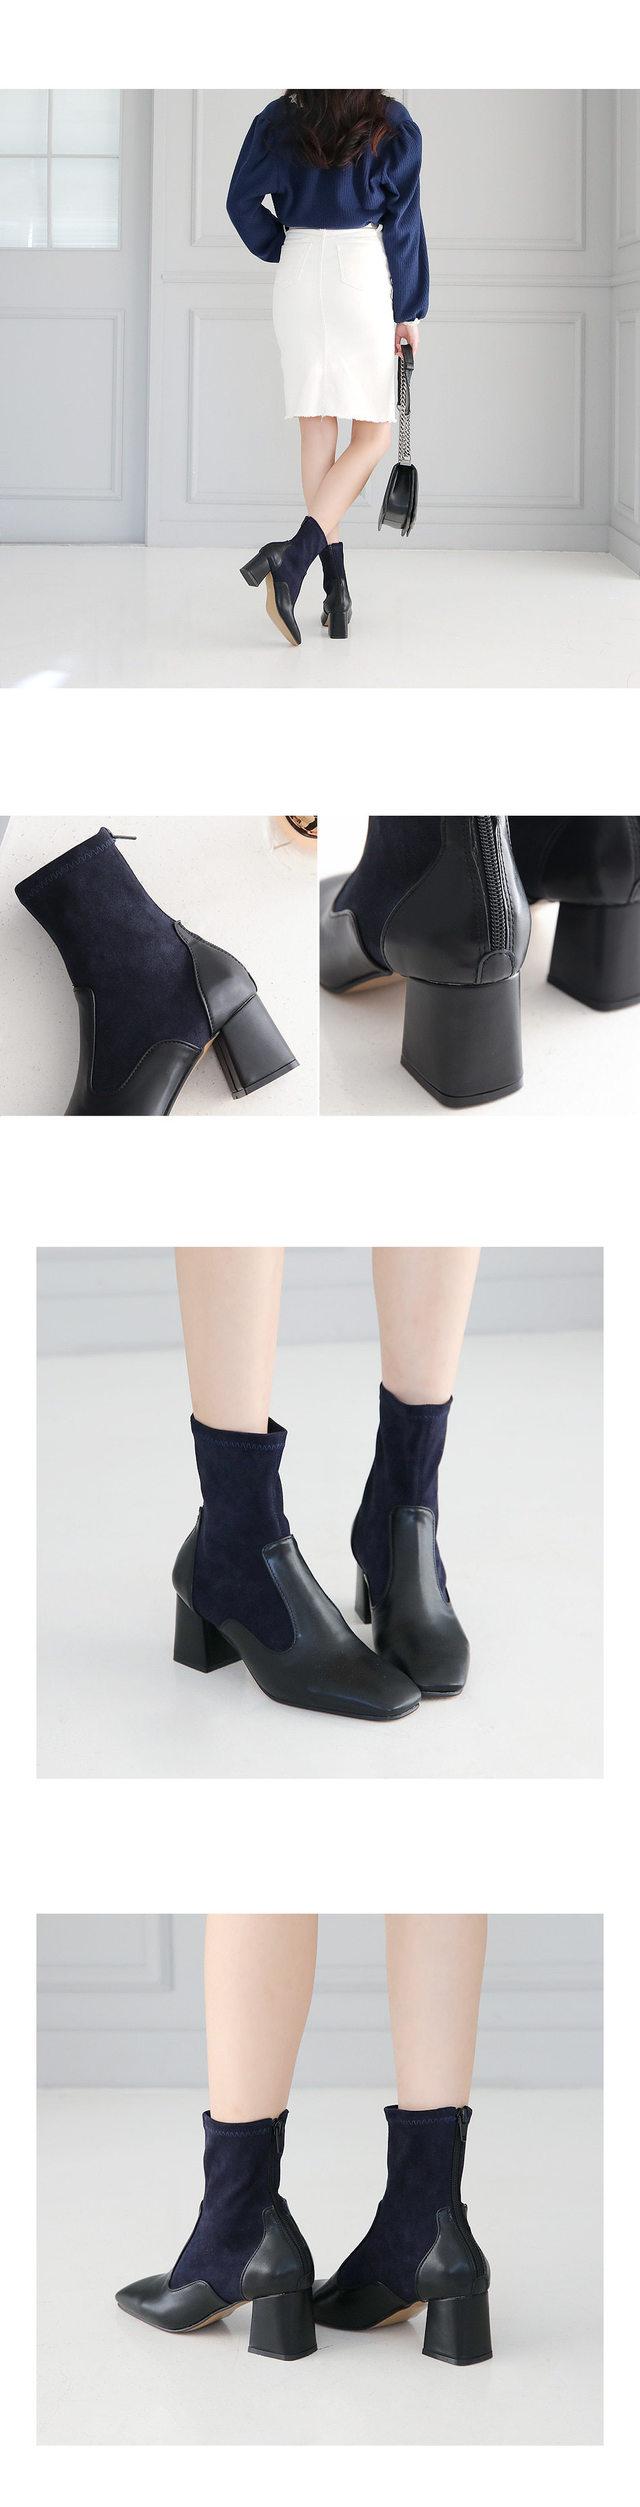 Walking Ankle Socks Boots 6.5cm